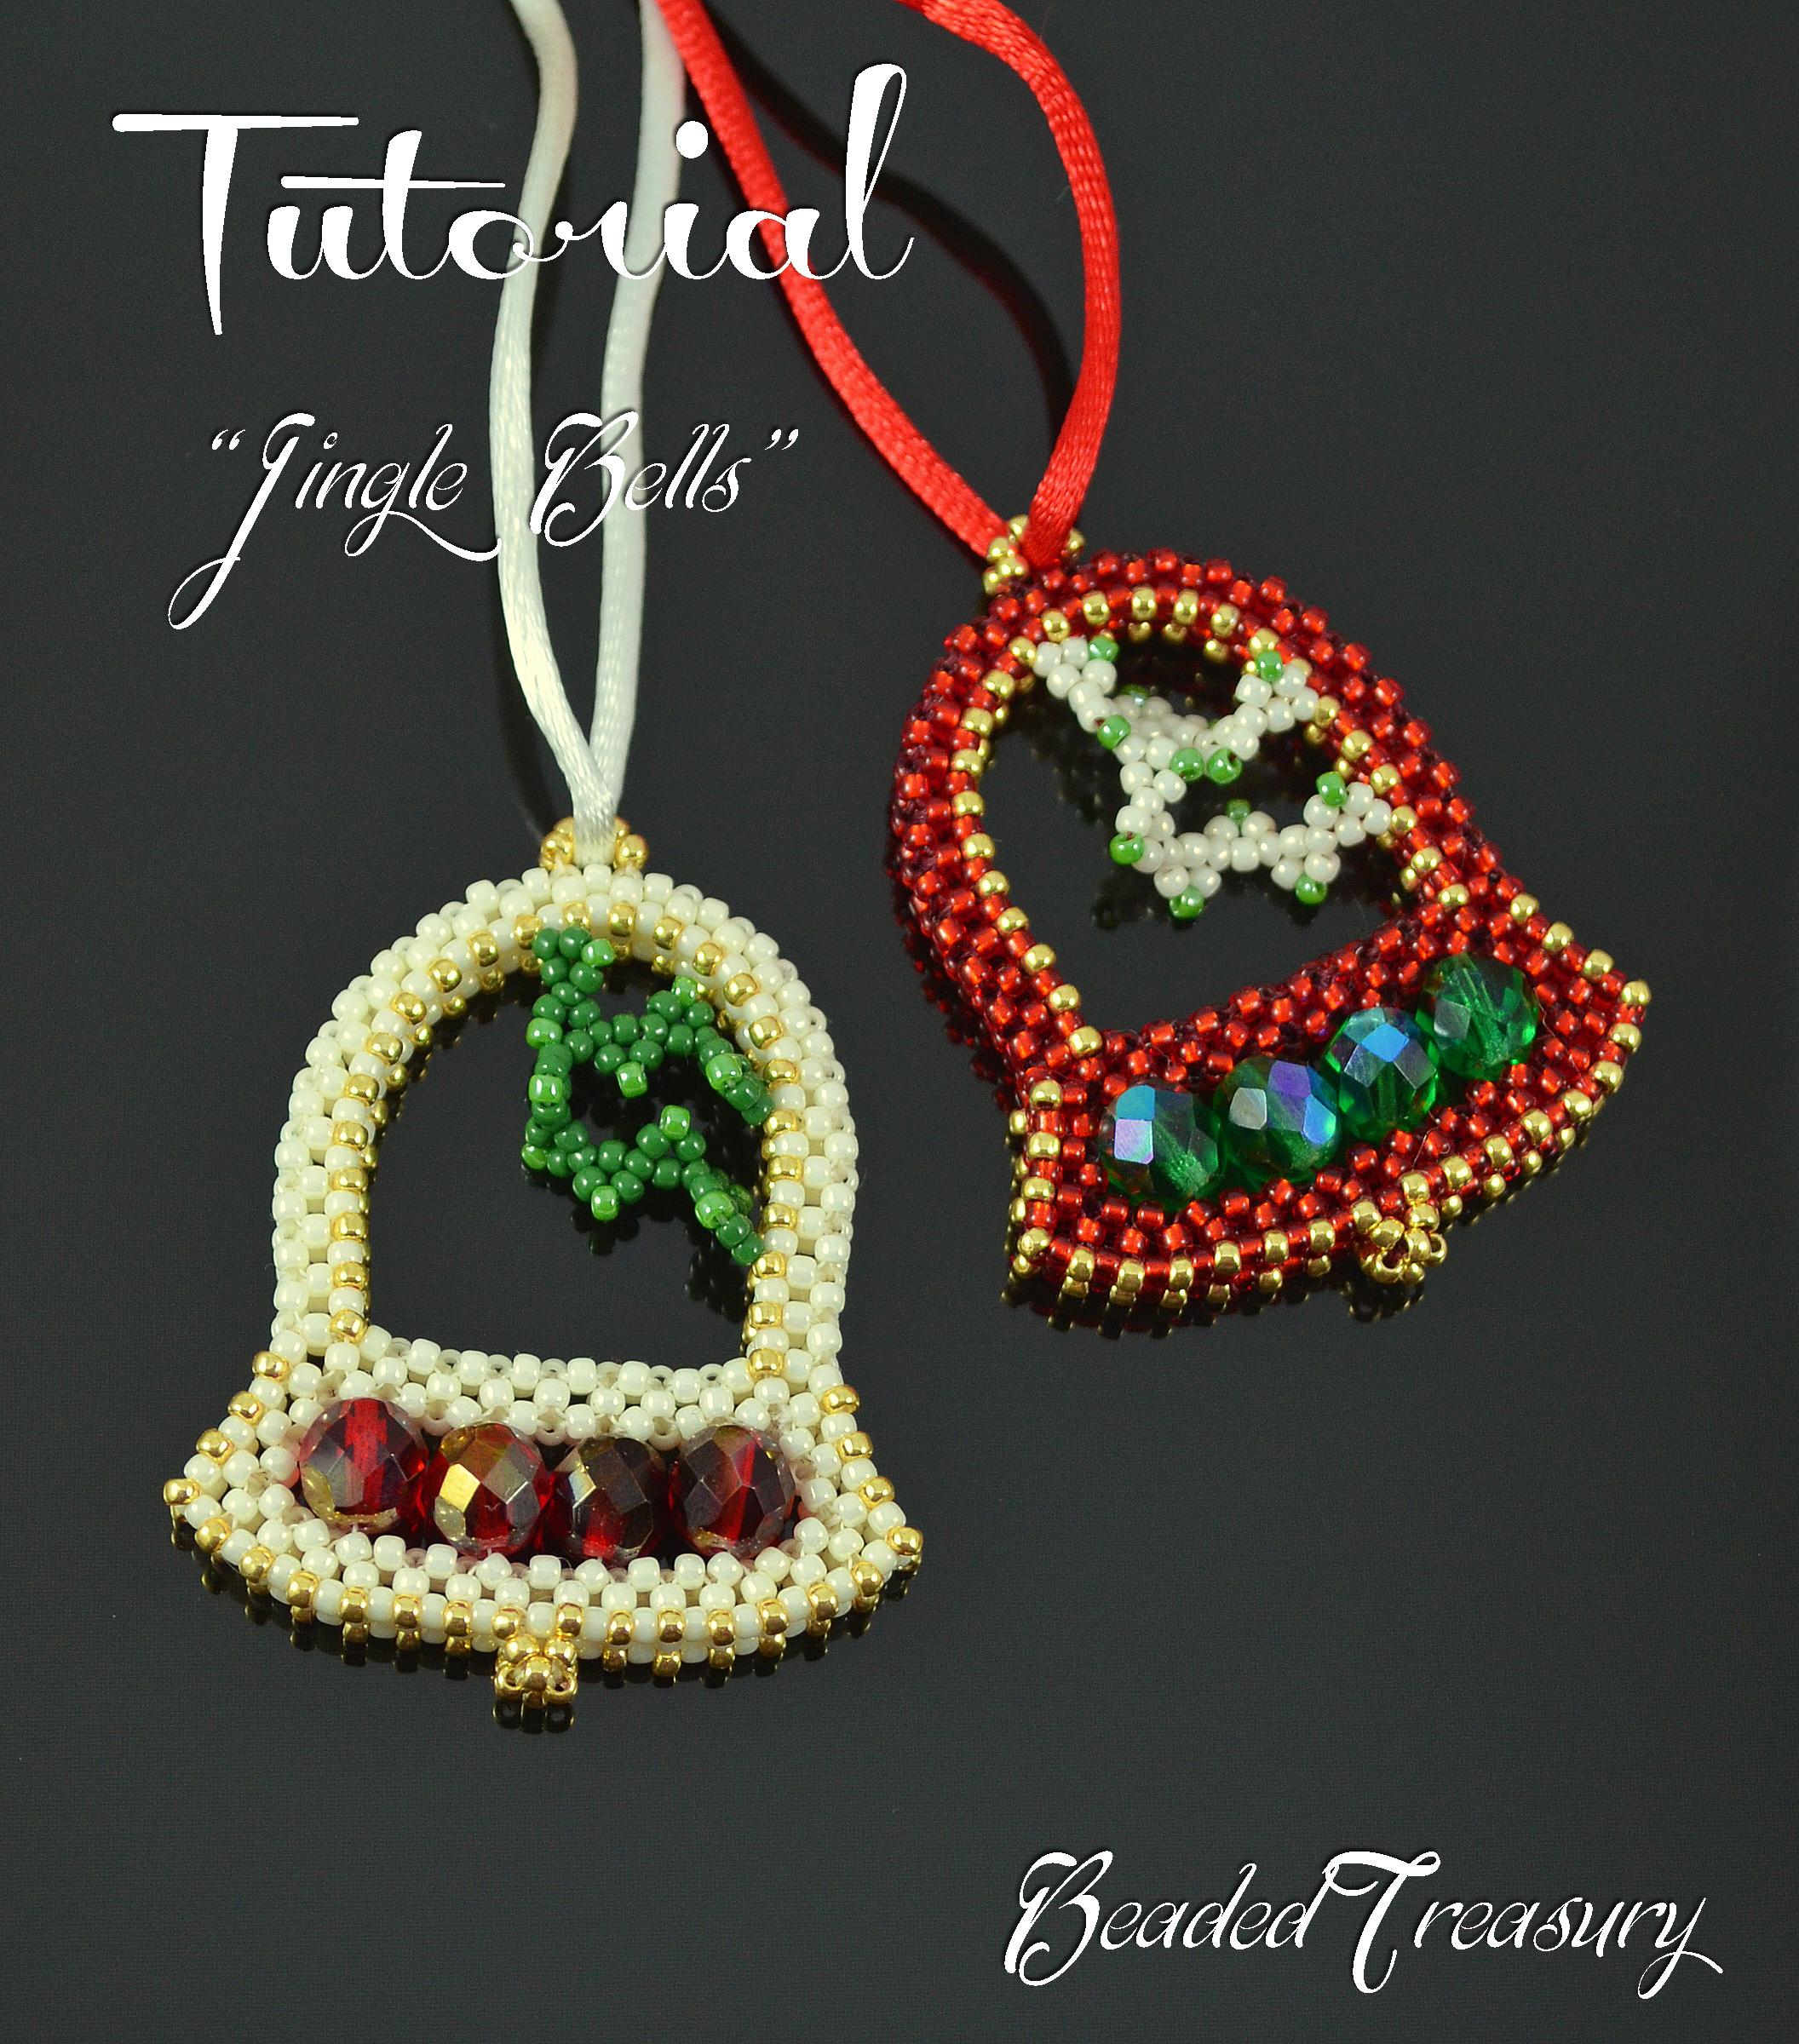 Ring pendant tutorials beadedtreasury jingle bells beaded christmas ornament pattern beading tutorial with seed beads christmas gift tutorial only baditri Choice Image